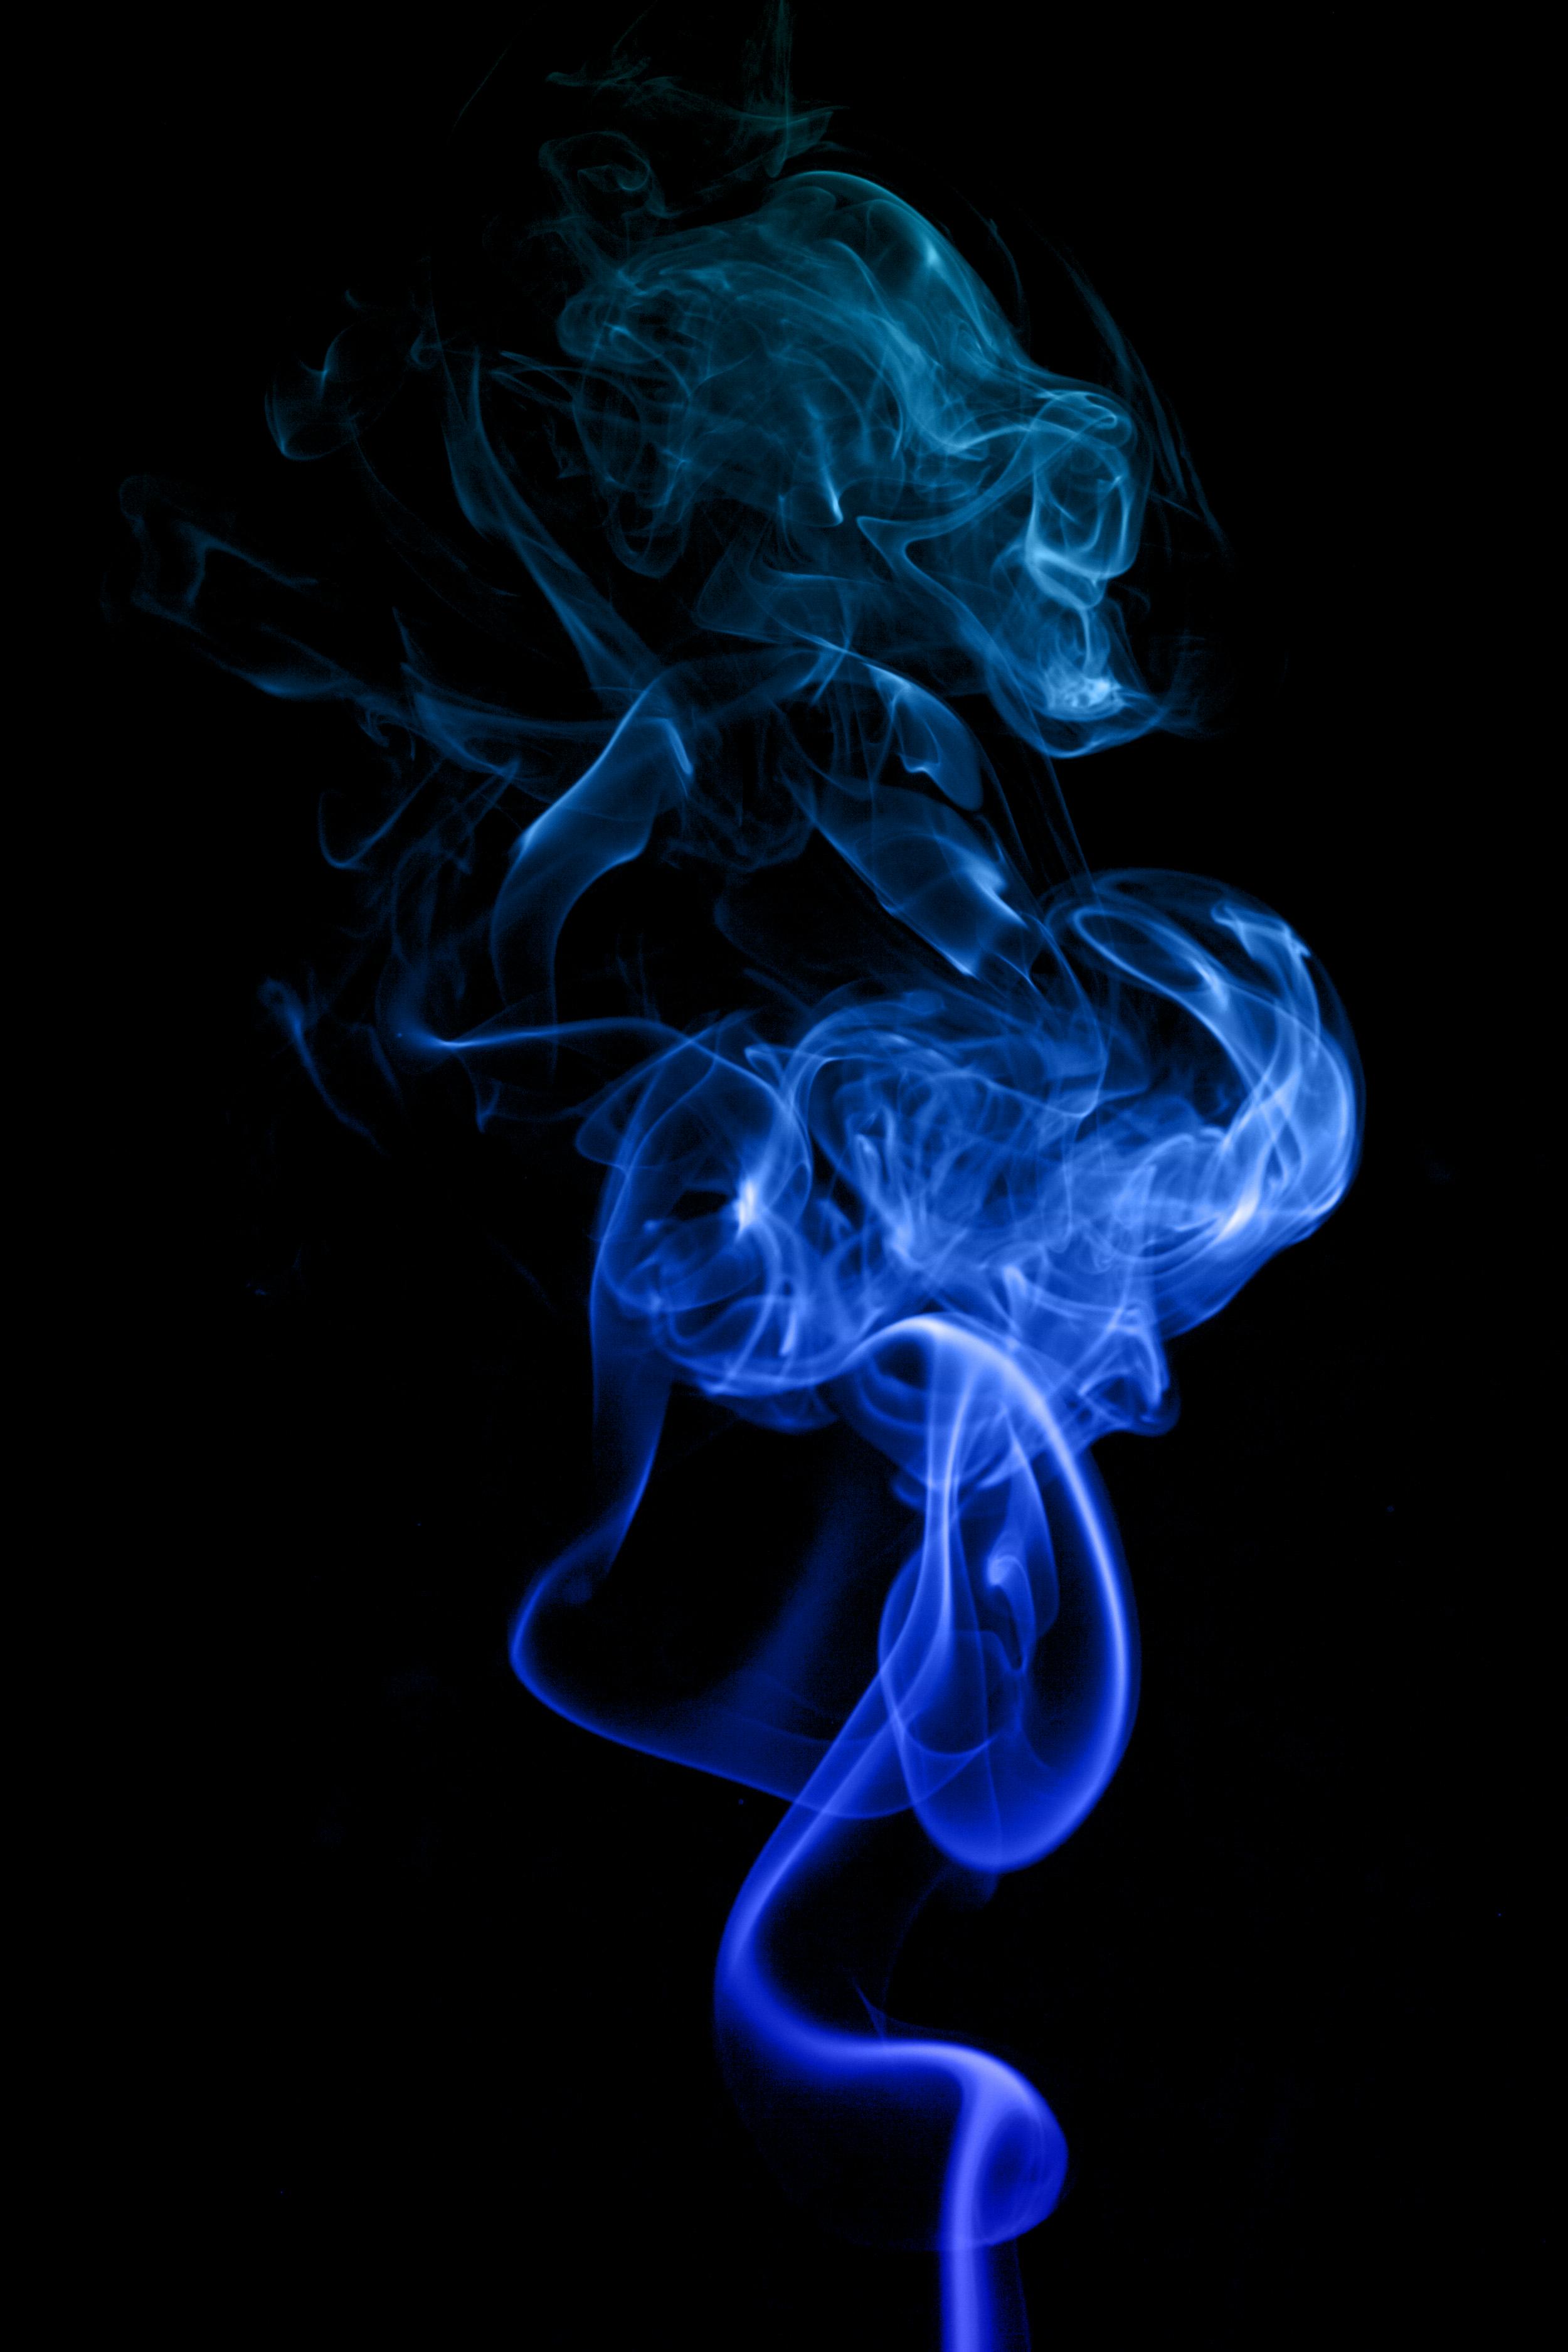 Smoke Blue Wall Decor : Blue dragon smoke art by black night shade on deviantart